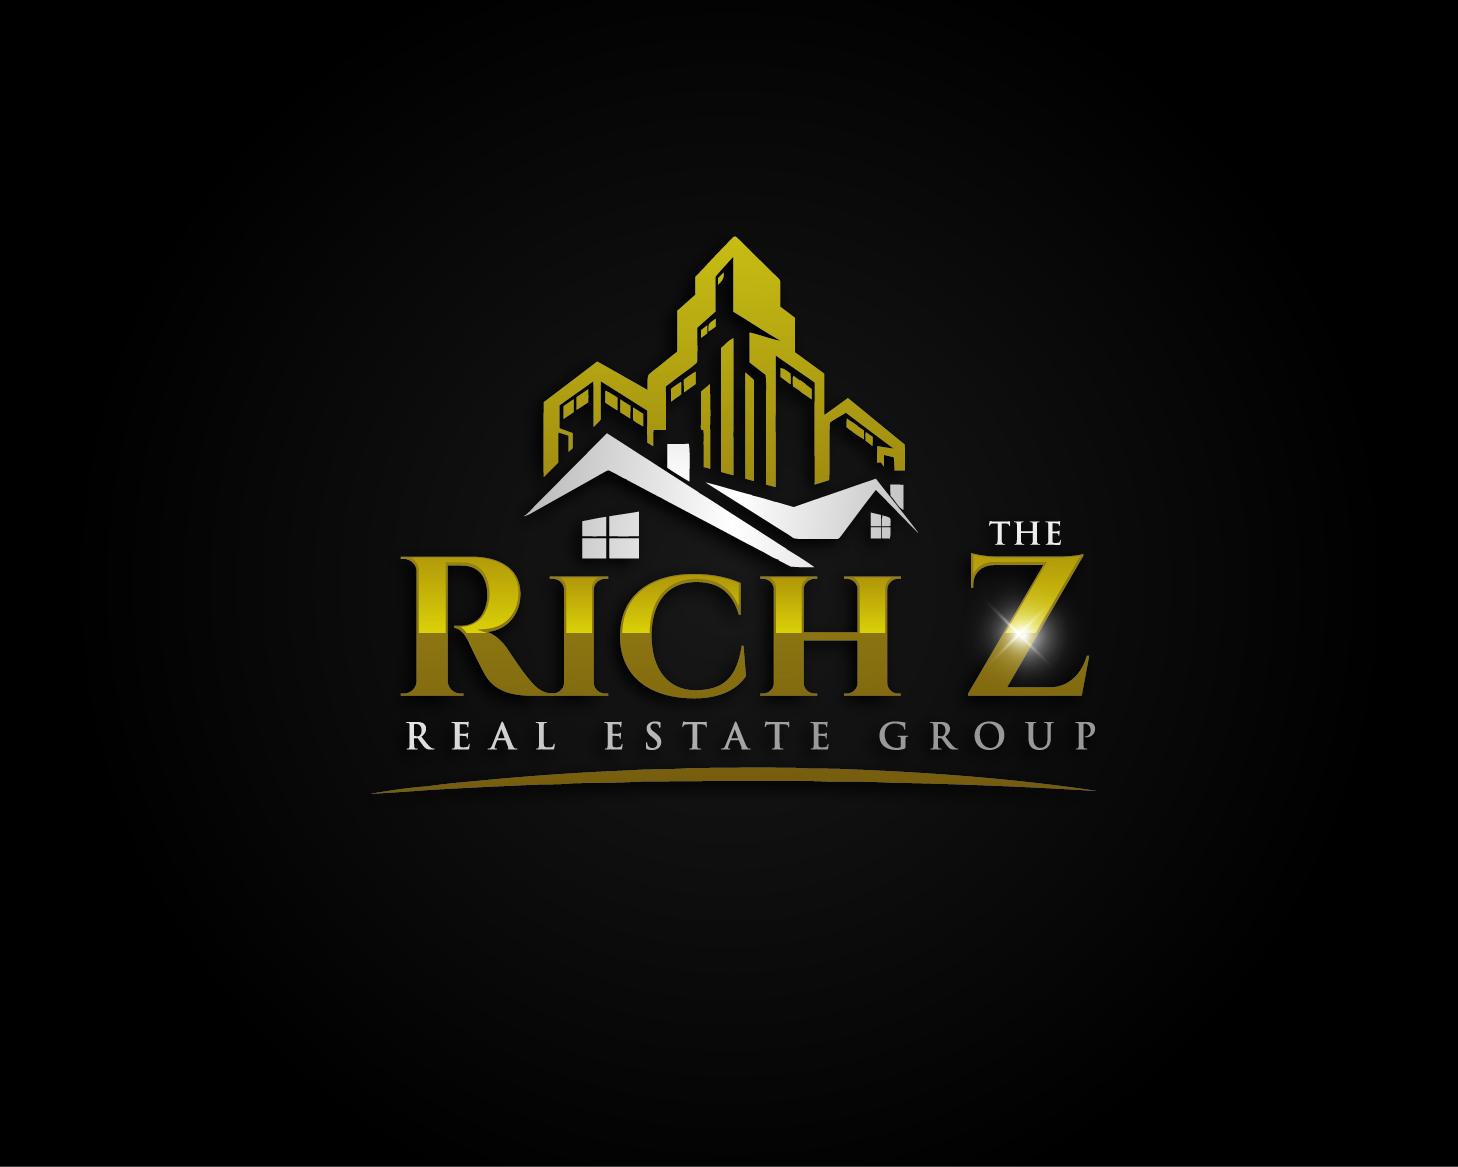 Logo Design by VENTSISLAV KOVACHEV - Entry No. 98 in the Logo Design Contest The Rich Z. Real Estate Group Logo Design.